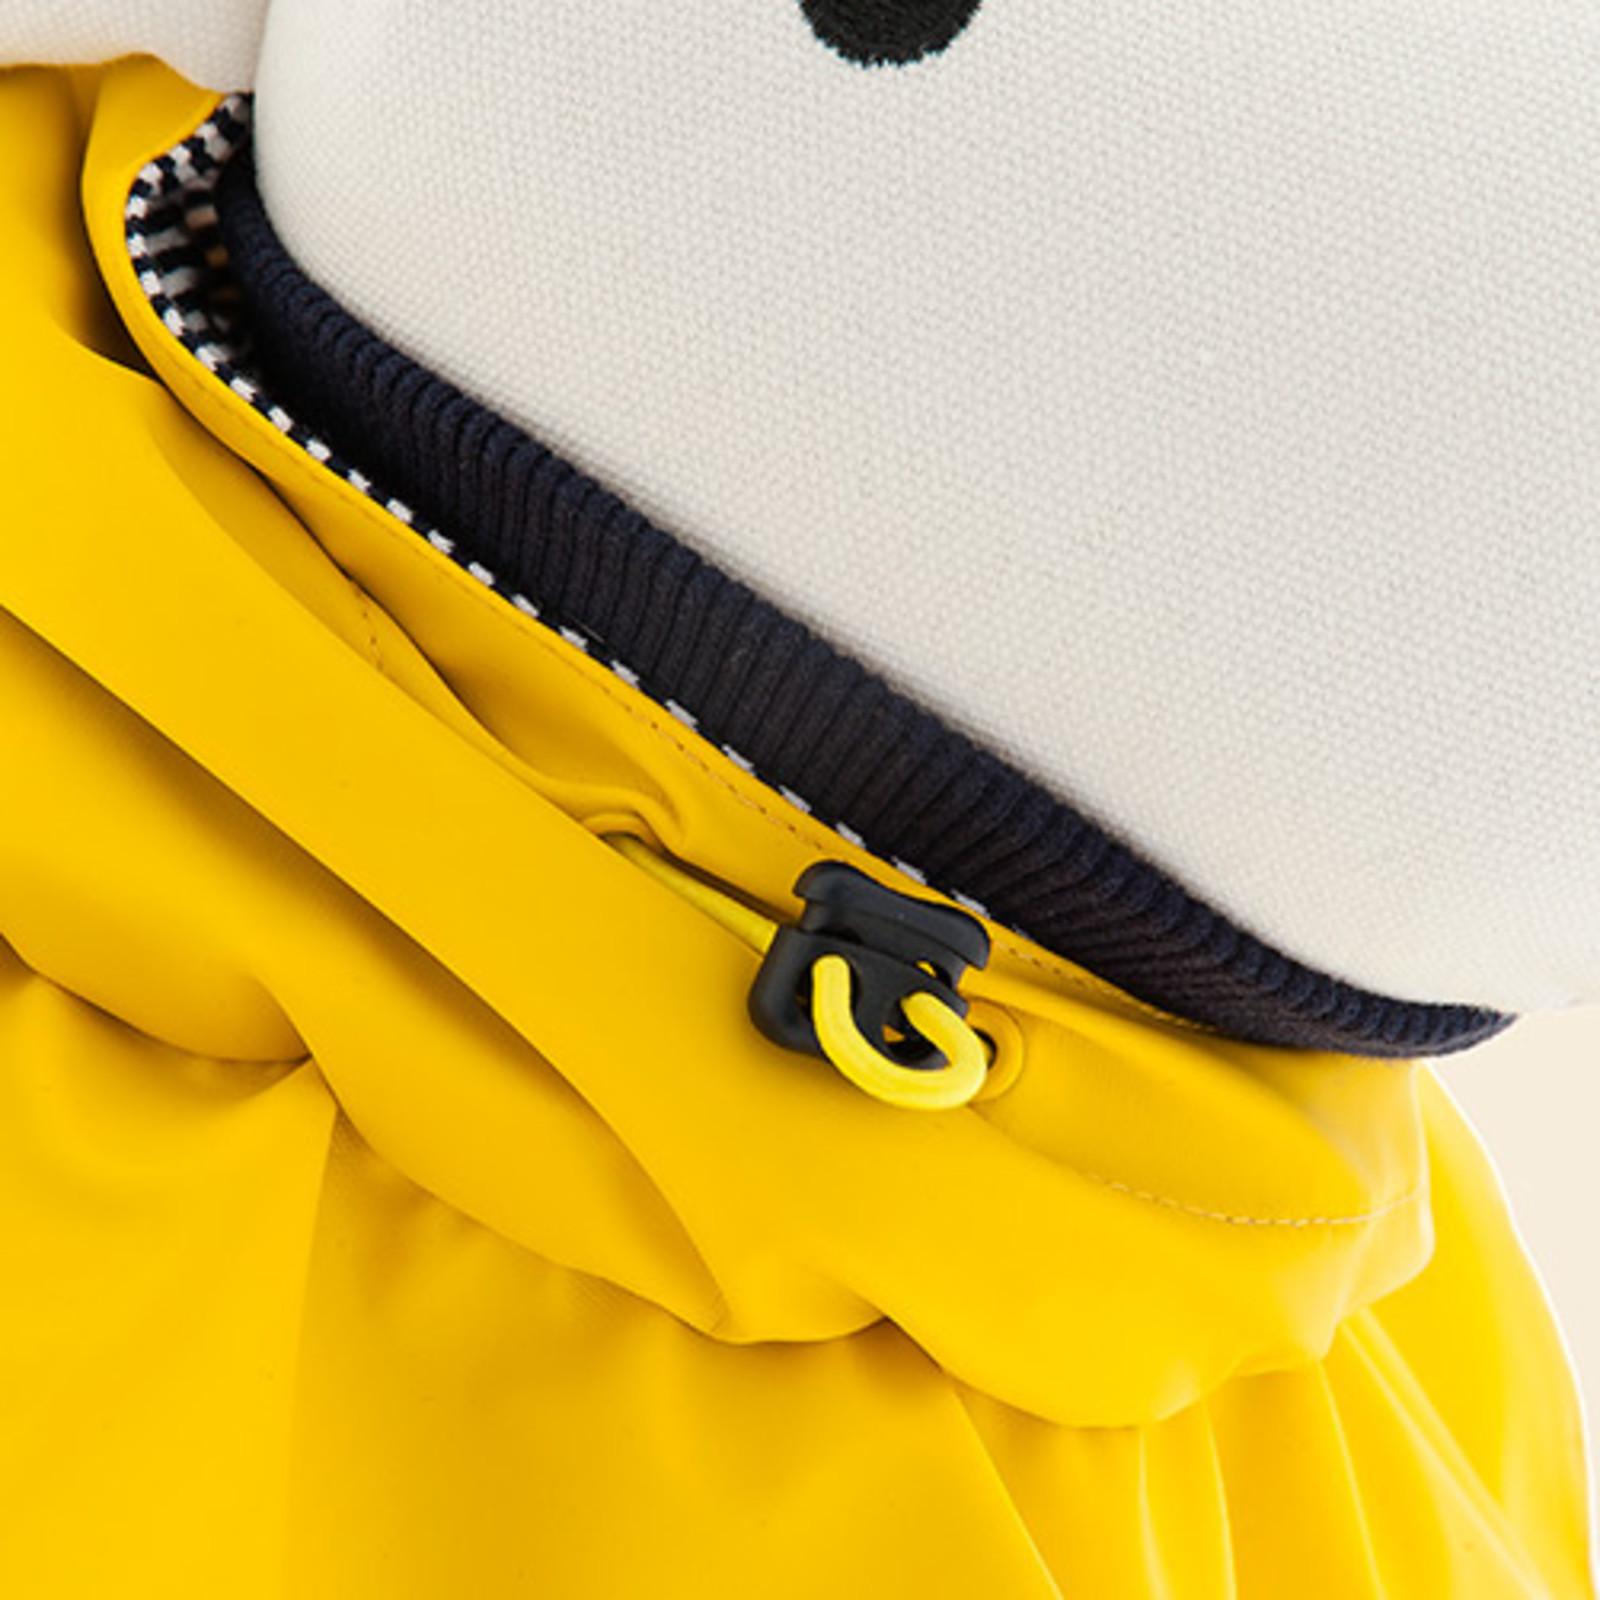 Gele Regencape mét kap   Ferribiella